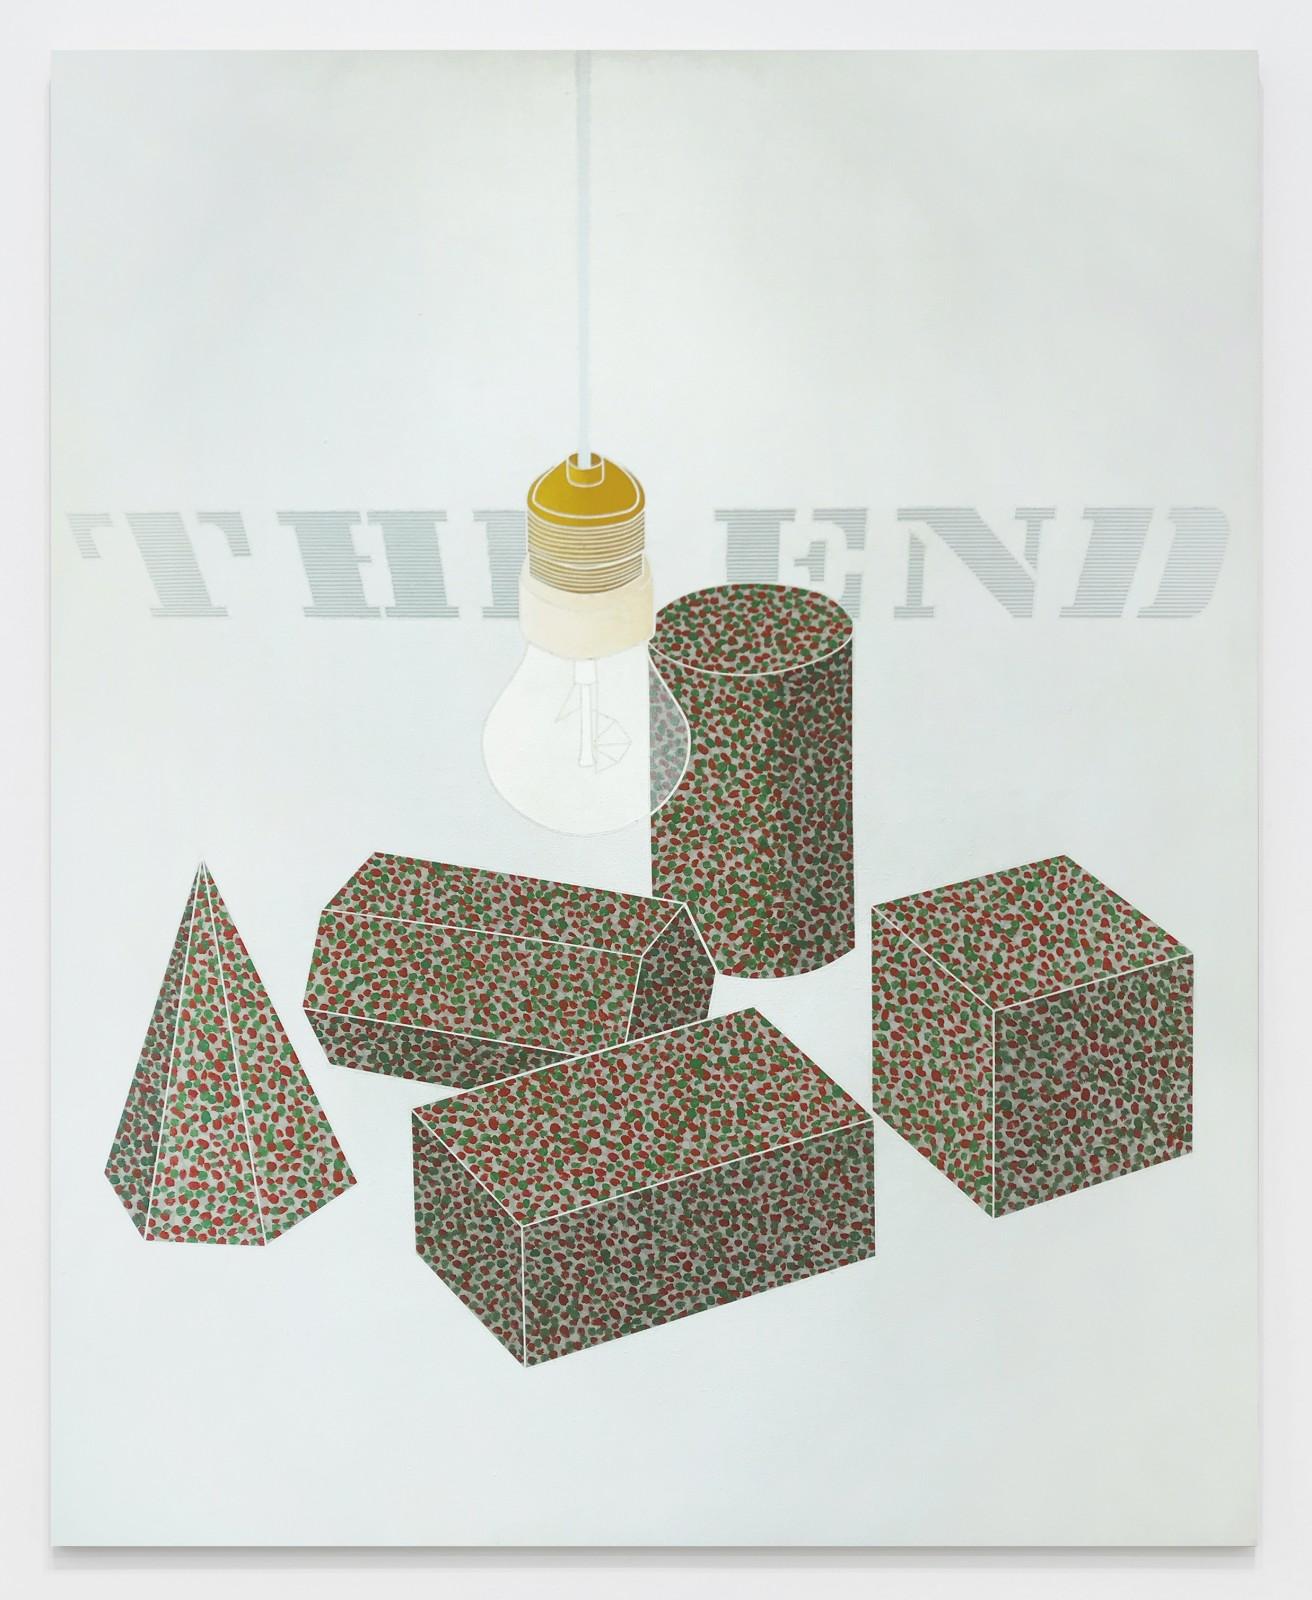 "<span class=""link fancybox-details-link""><a href=""/exhibitions/553/works/artworks_standalone11000/"">View Detail Page</a></span><div class=""artist""><span class=""artist""><strong>EMILIO TADINI</strong></span></div><div class=""title""><em>Paesaggio Occidentale / Western Landscape</em>, 1969</div><div class=""medium"">Acrylic on canvas</div><div class=""dimensions""><div class=""dimensions"">63 3/4 x 51 1/8 inches</div><div class=""dimensions"">(162 x 130 cm)</div></div><div class=""price price_unavailable"">Sold</div>"